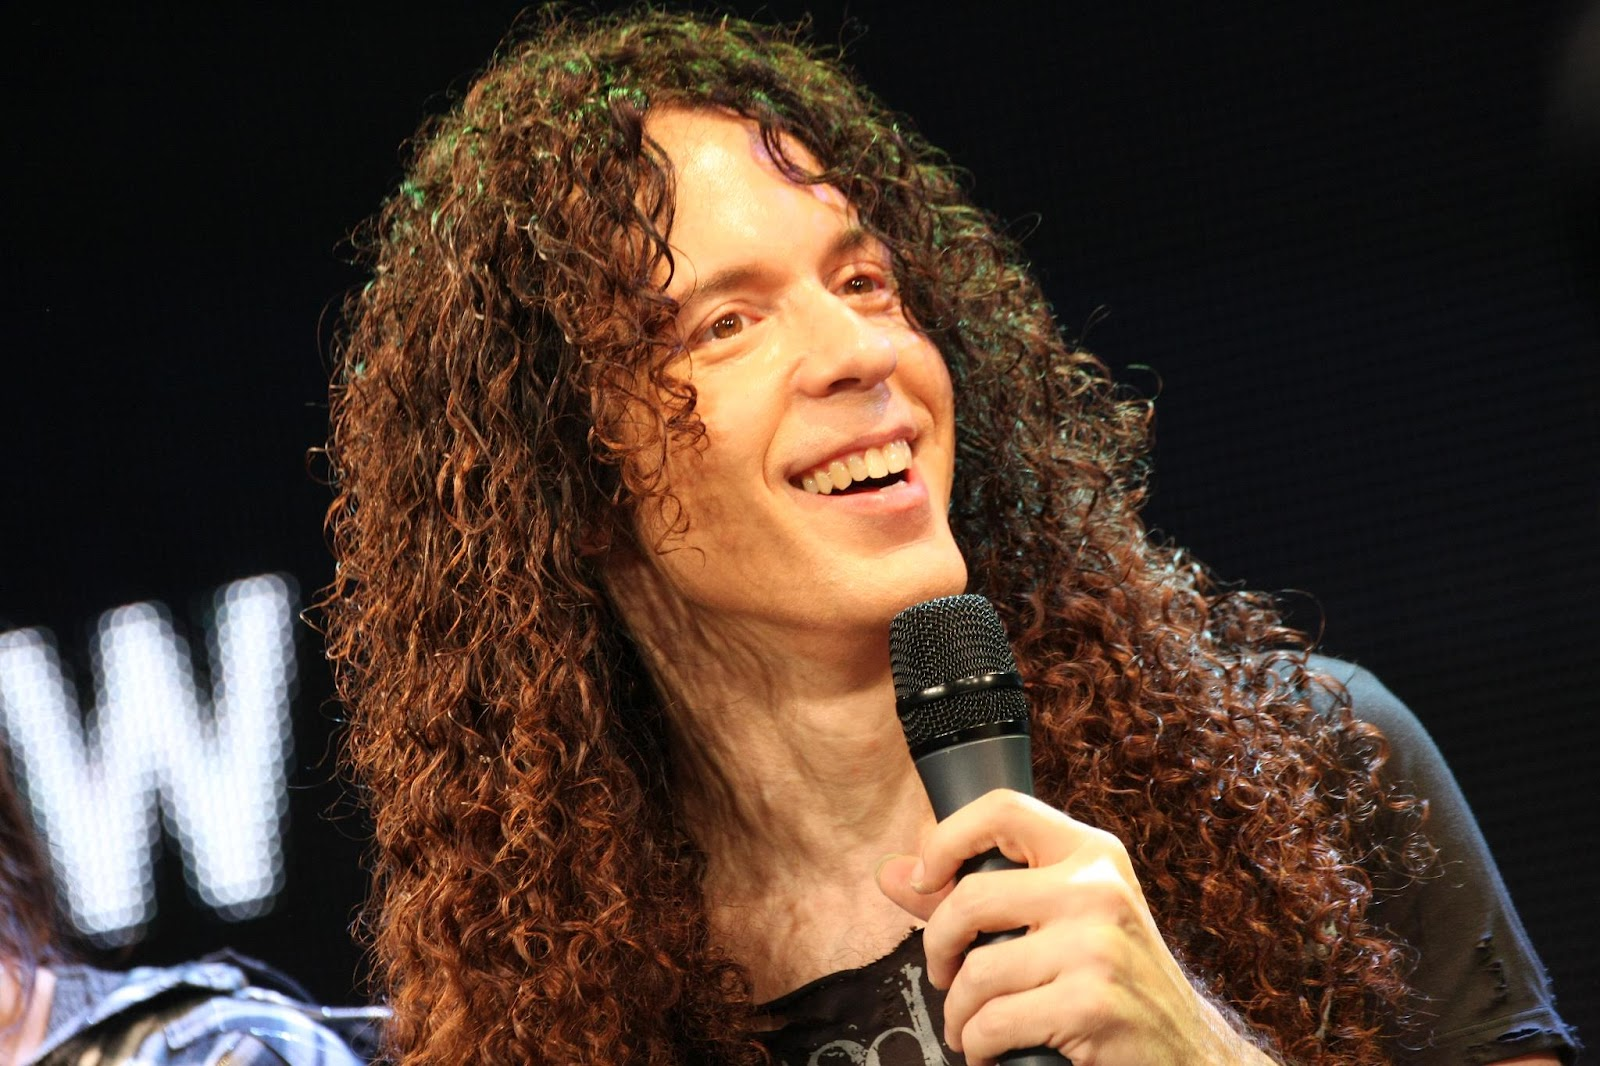 Marty Friedman: Fue fantástico trabajar con Dave Mustaine